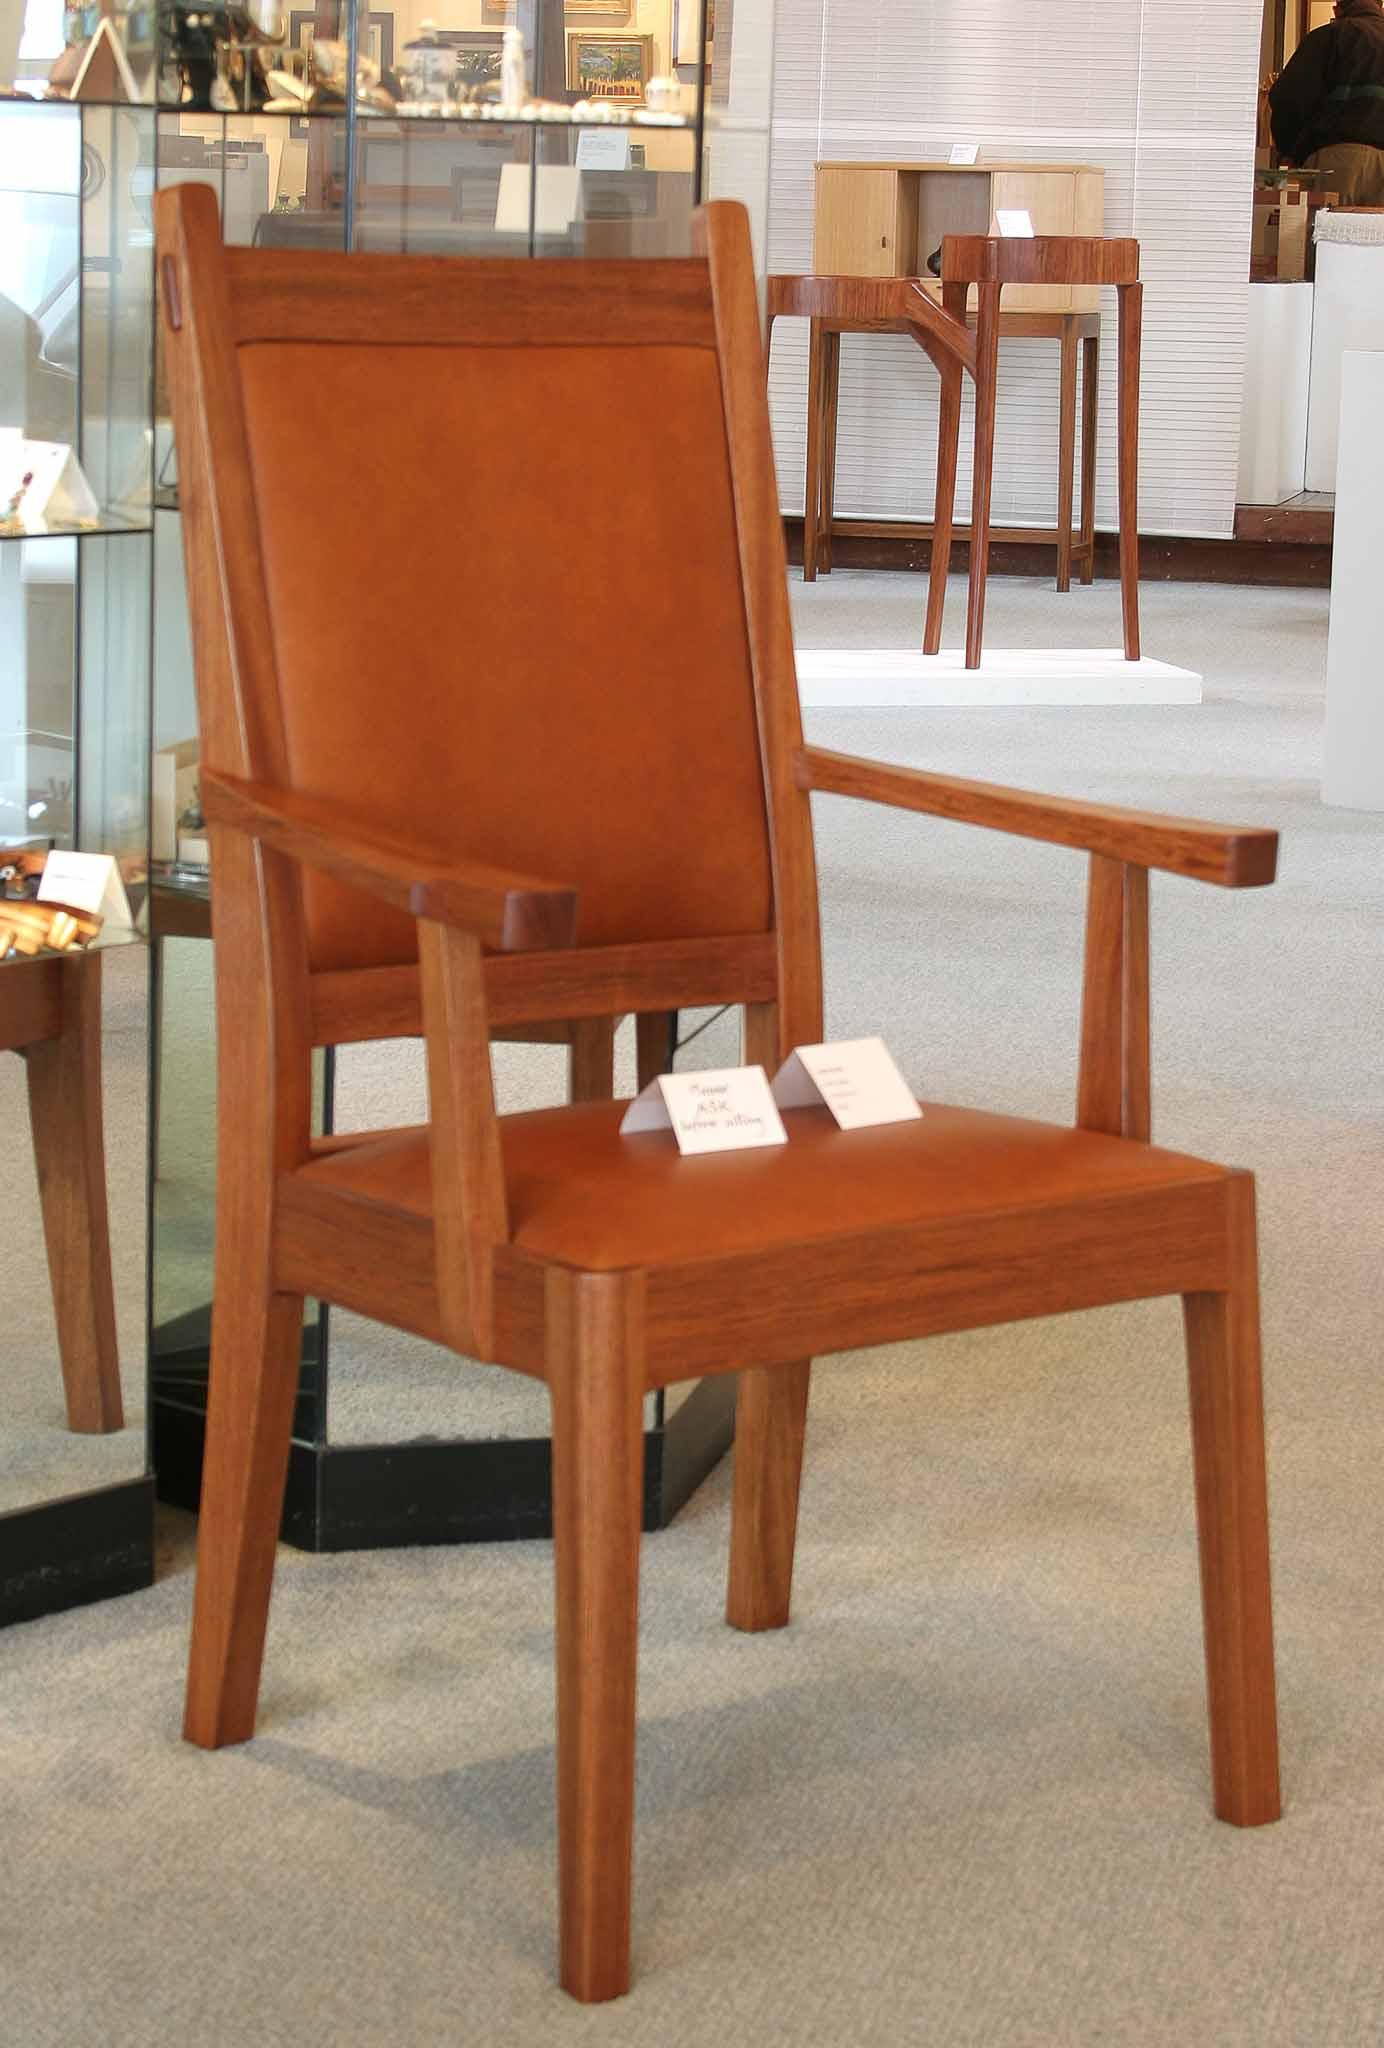 show chair